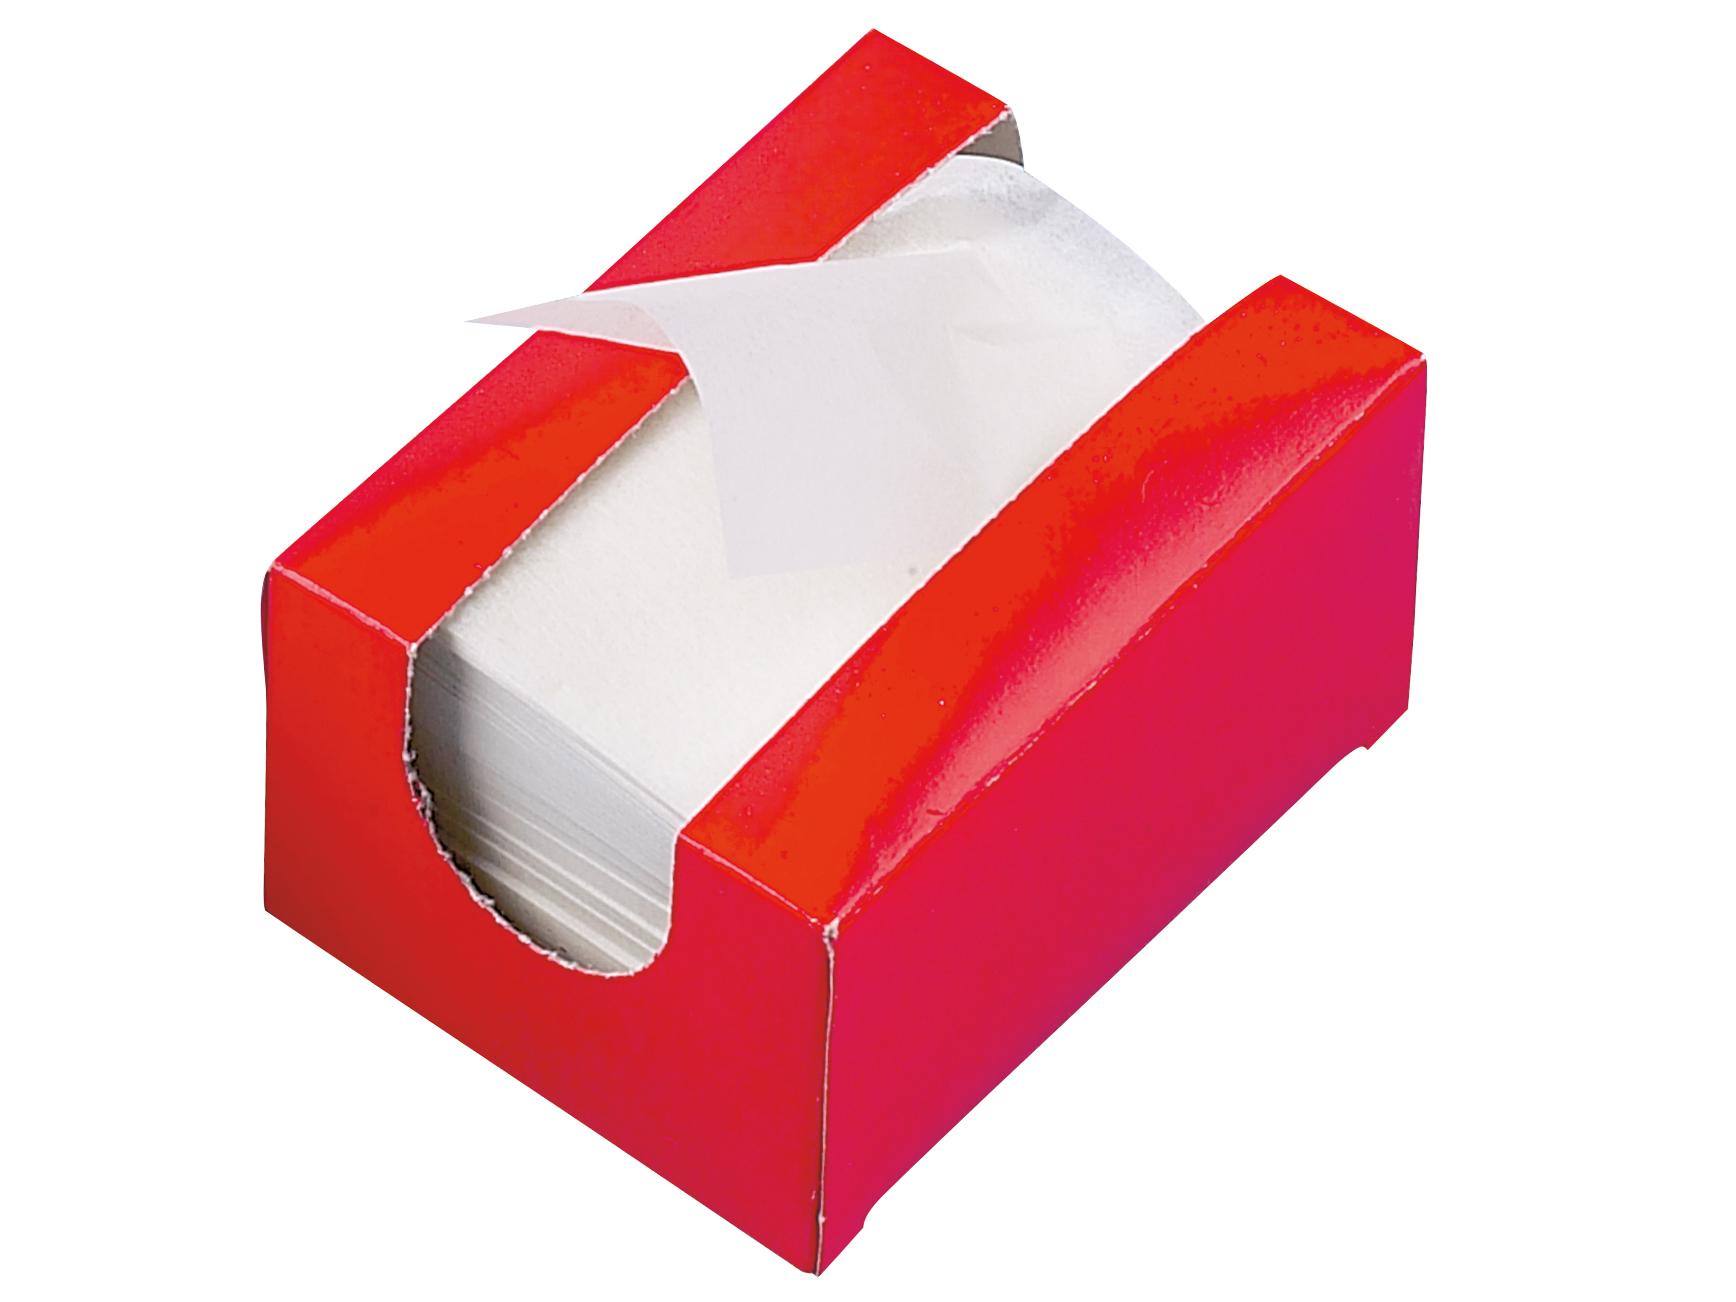 Papírky na trvalou ondulaci Sibel Super Tex, 75 x 50 mm - 1000 ks (4330371)